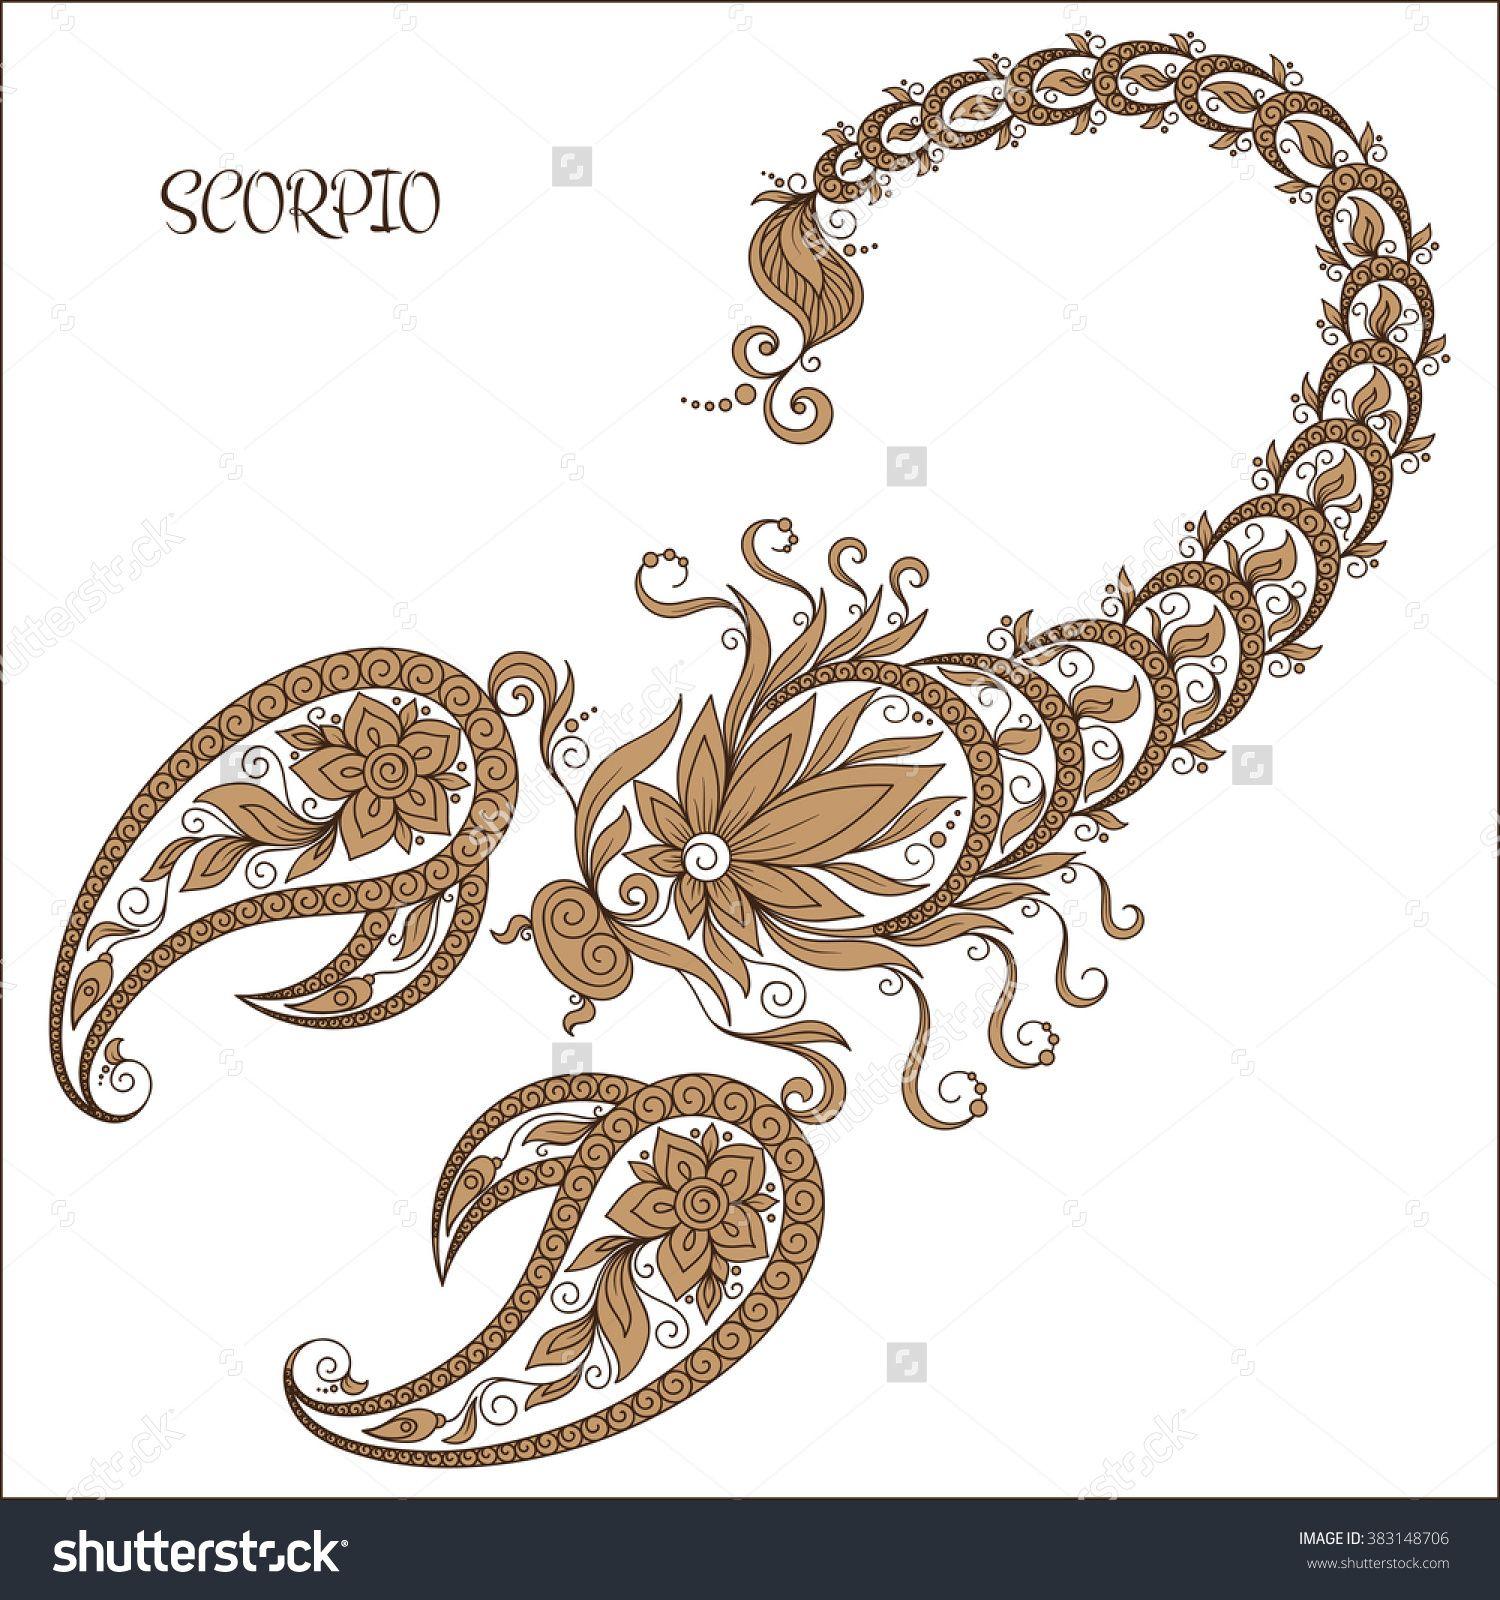 Scorpio Zodiac Horoscope Constellation Sign Symbol Tattoo (75)